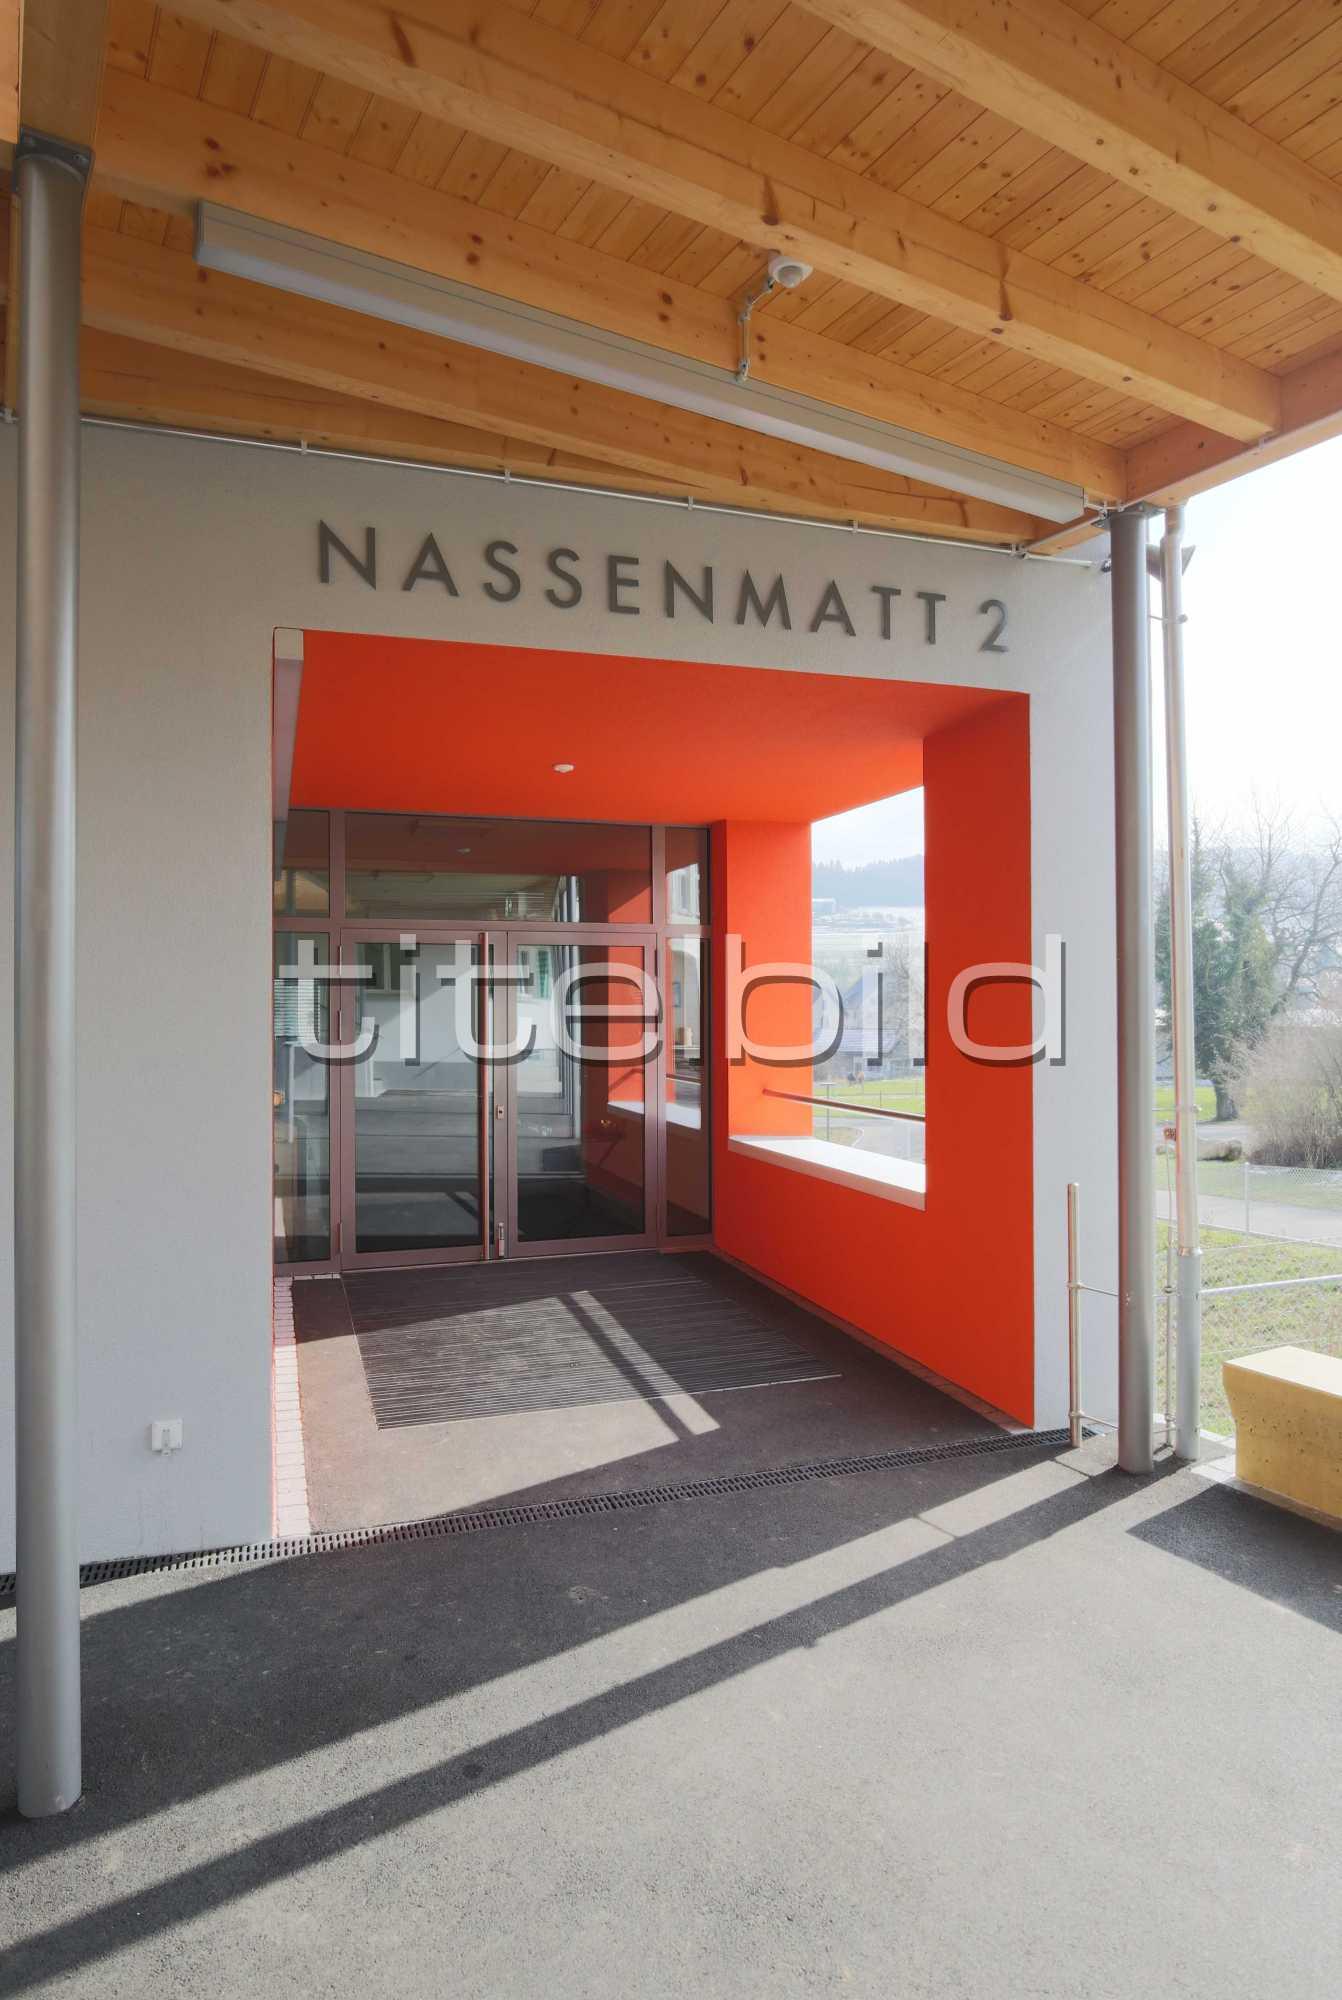 Projektbild-Nr. 4: Neubau + Umbau Schulhaus Nassenmatt